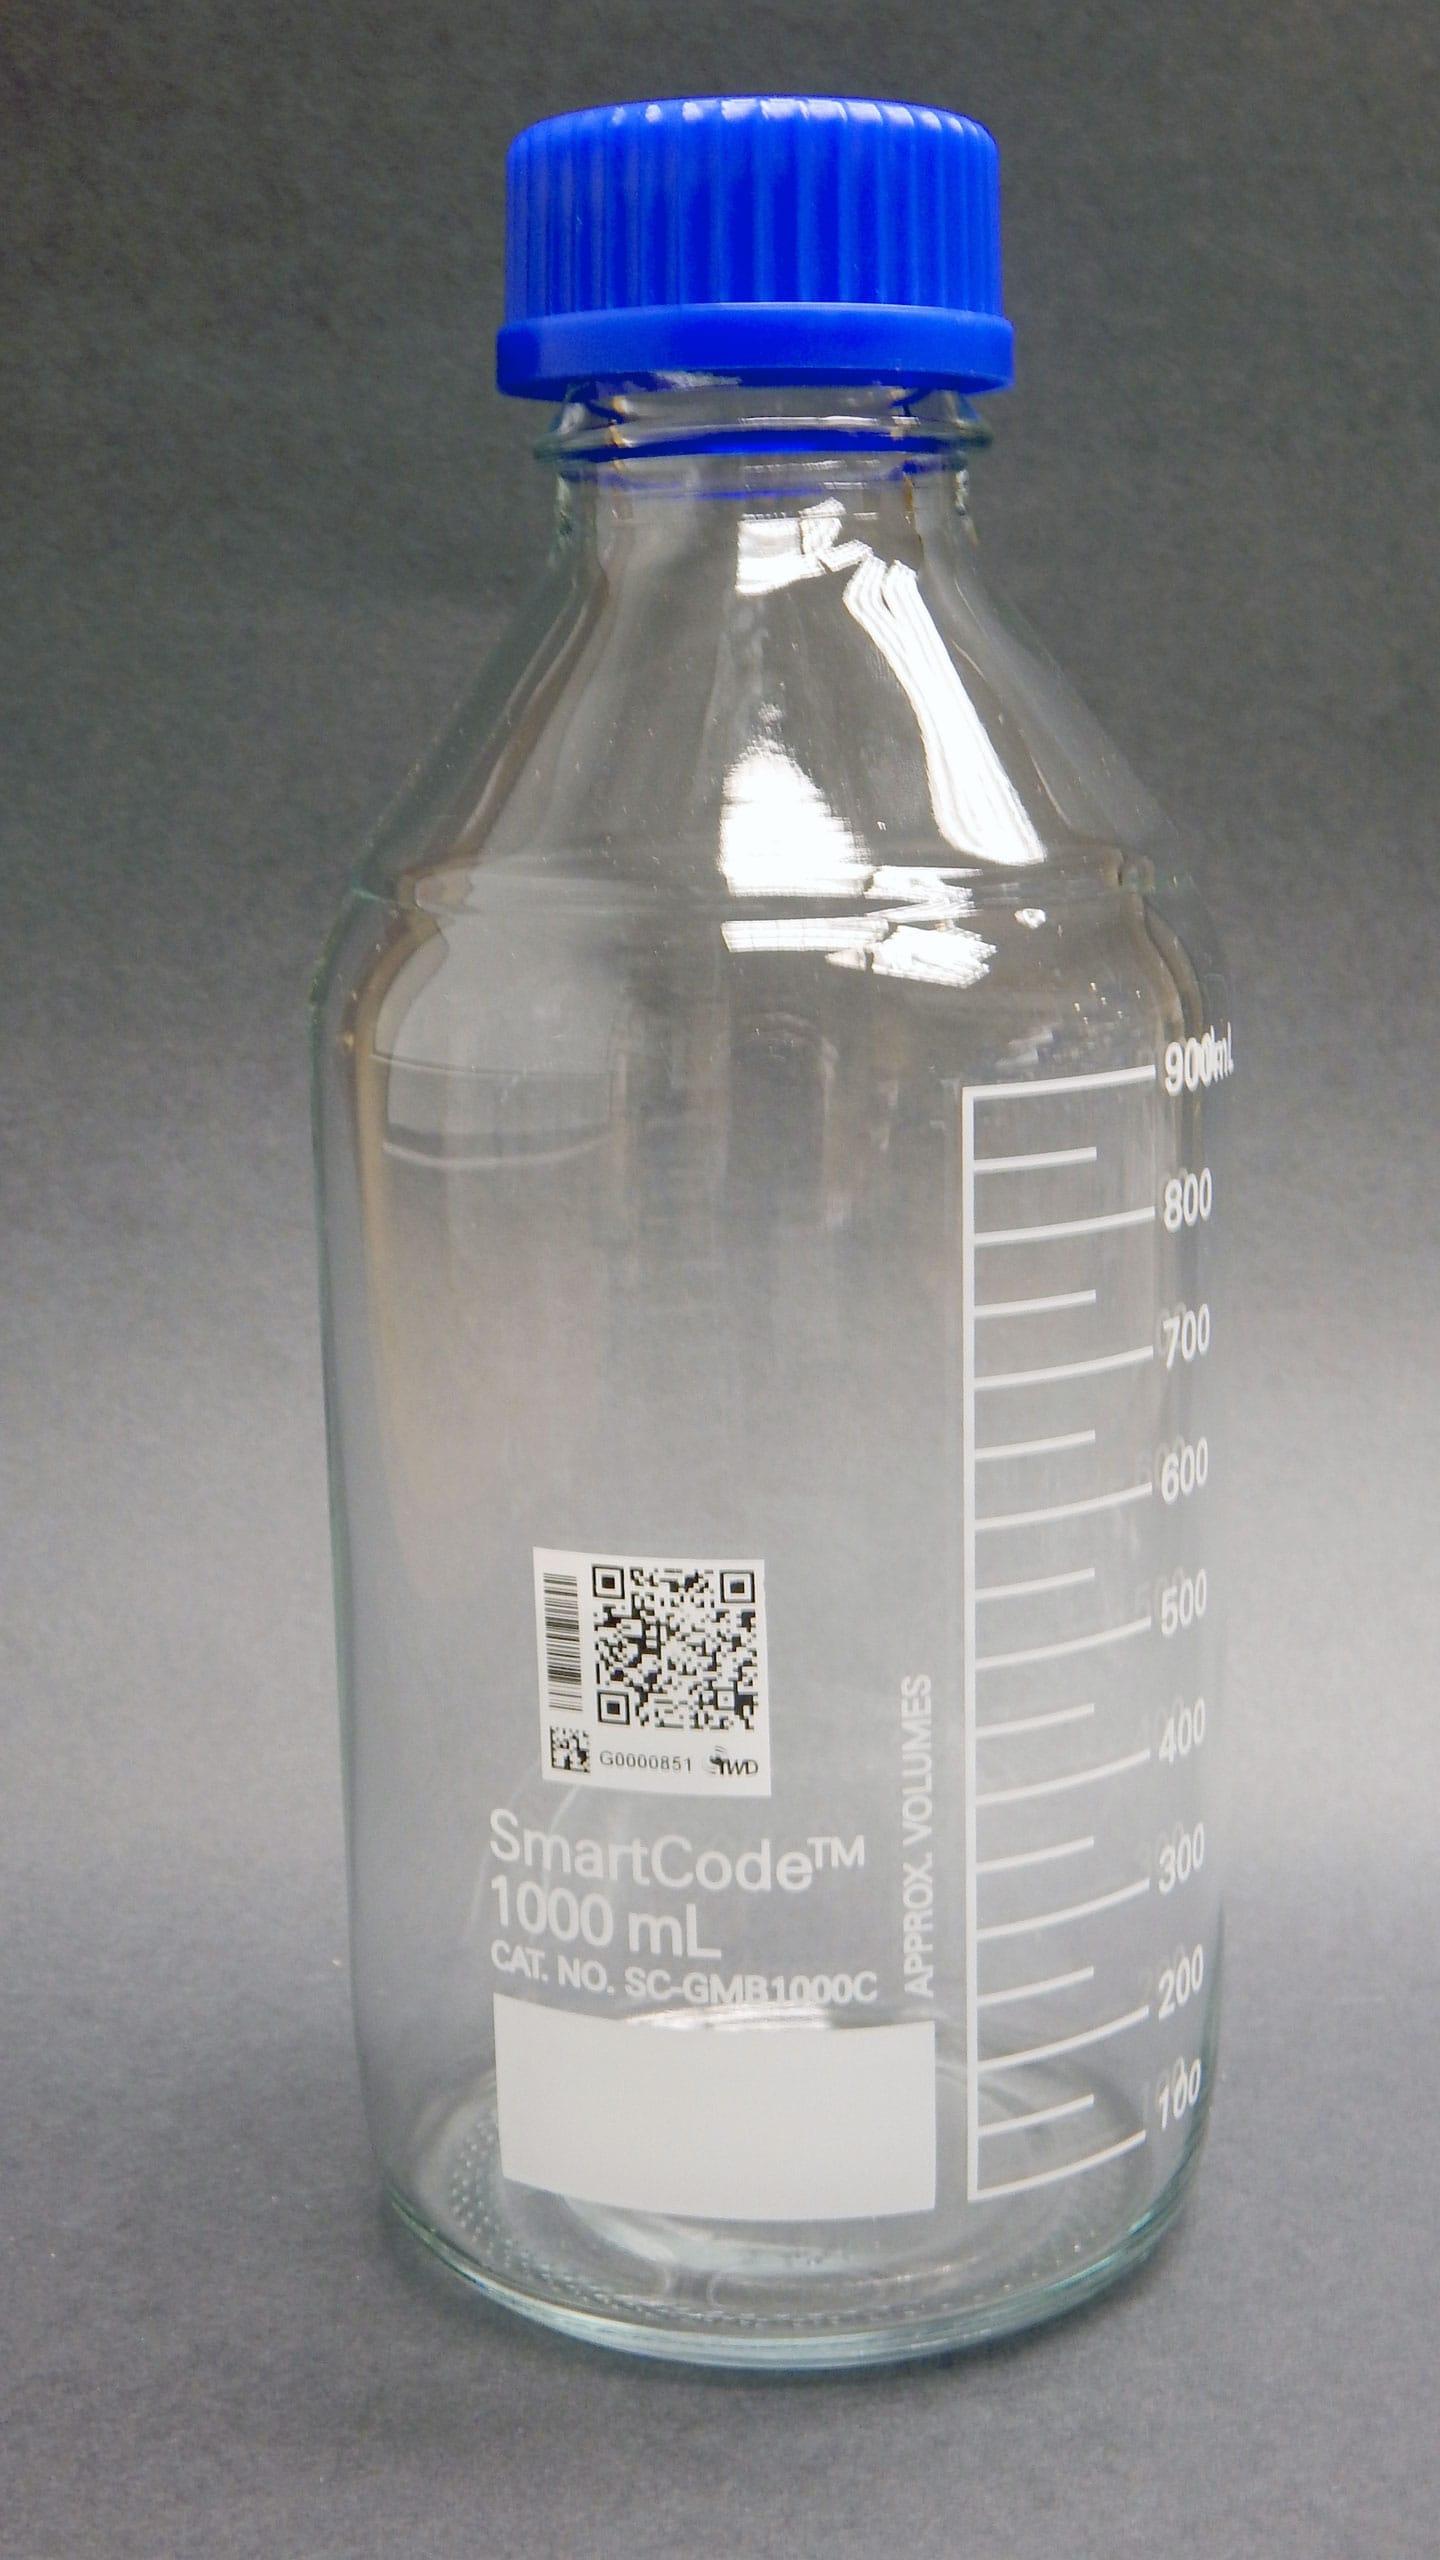 SC-GMB1000C